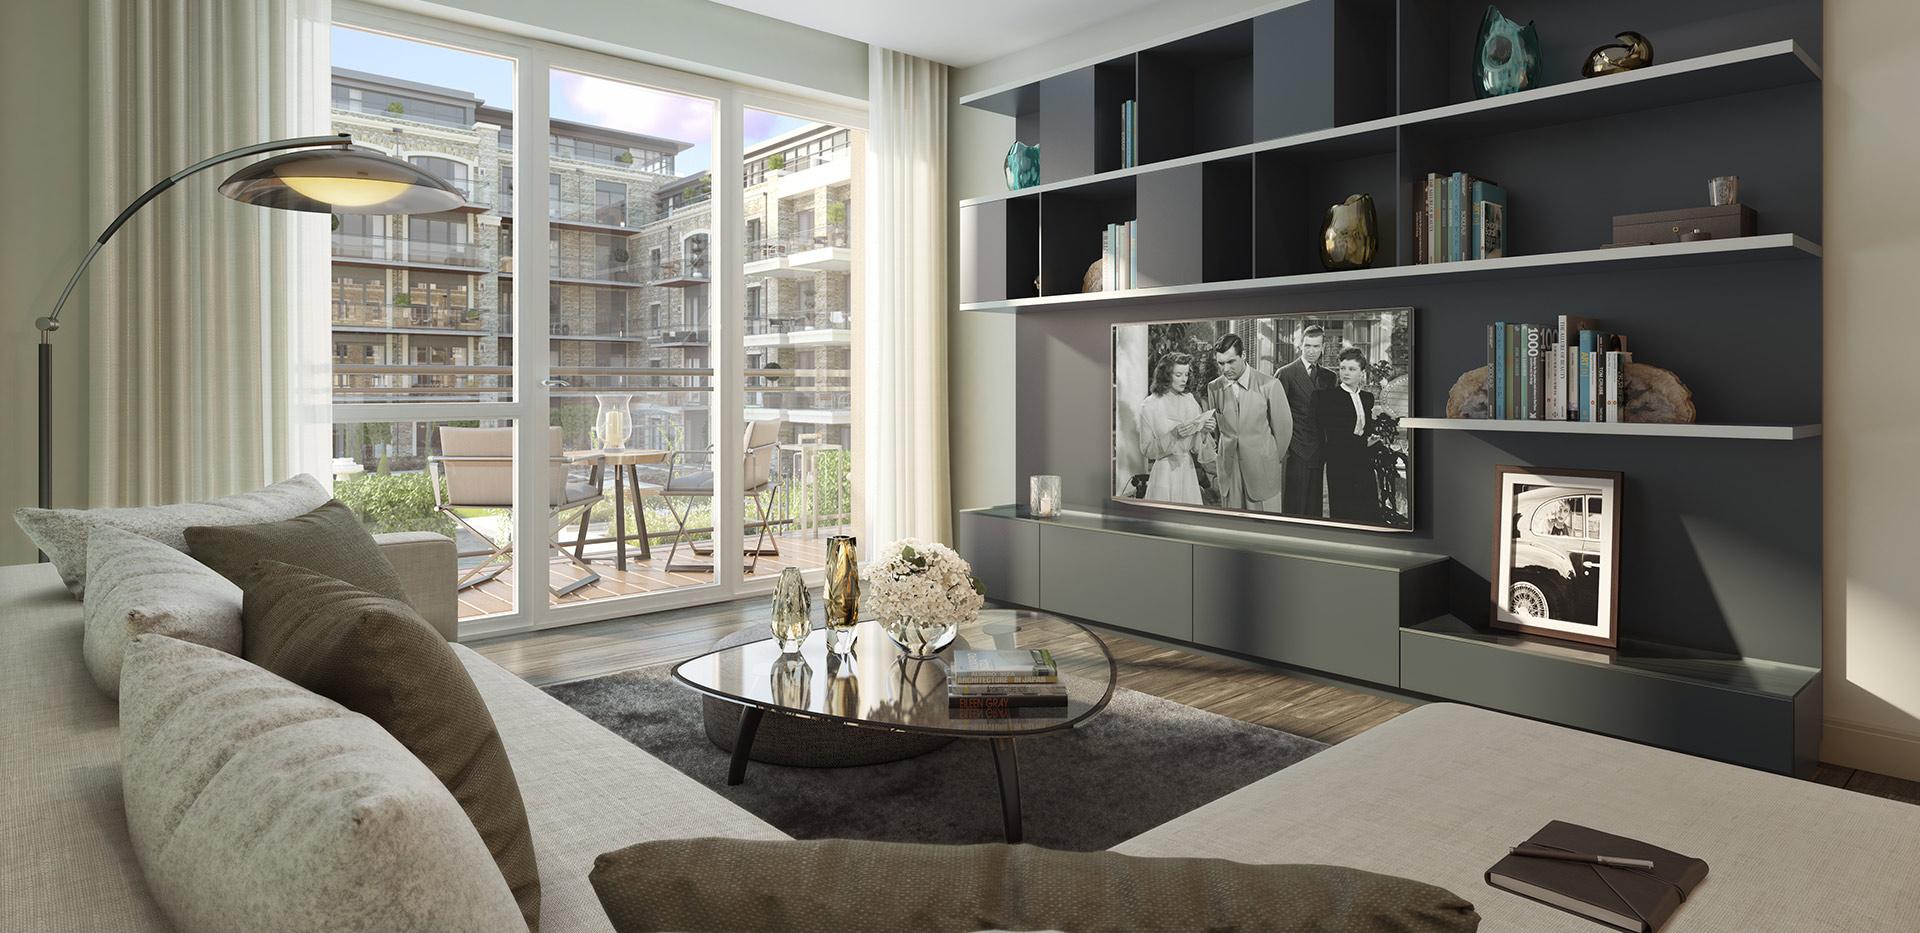 Berkeley, Chiswick Gate, Apartments, Living Room, Internal